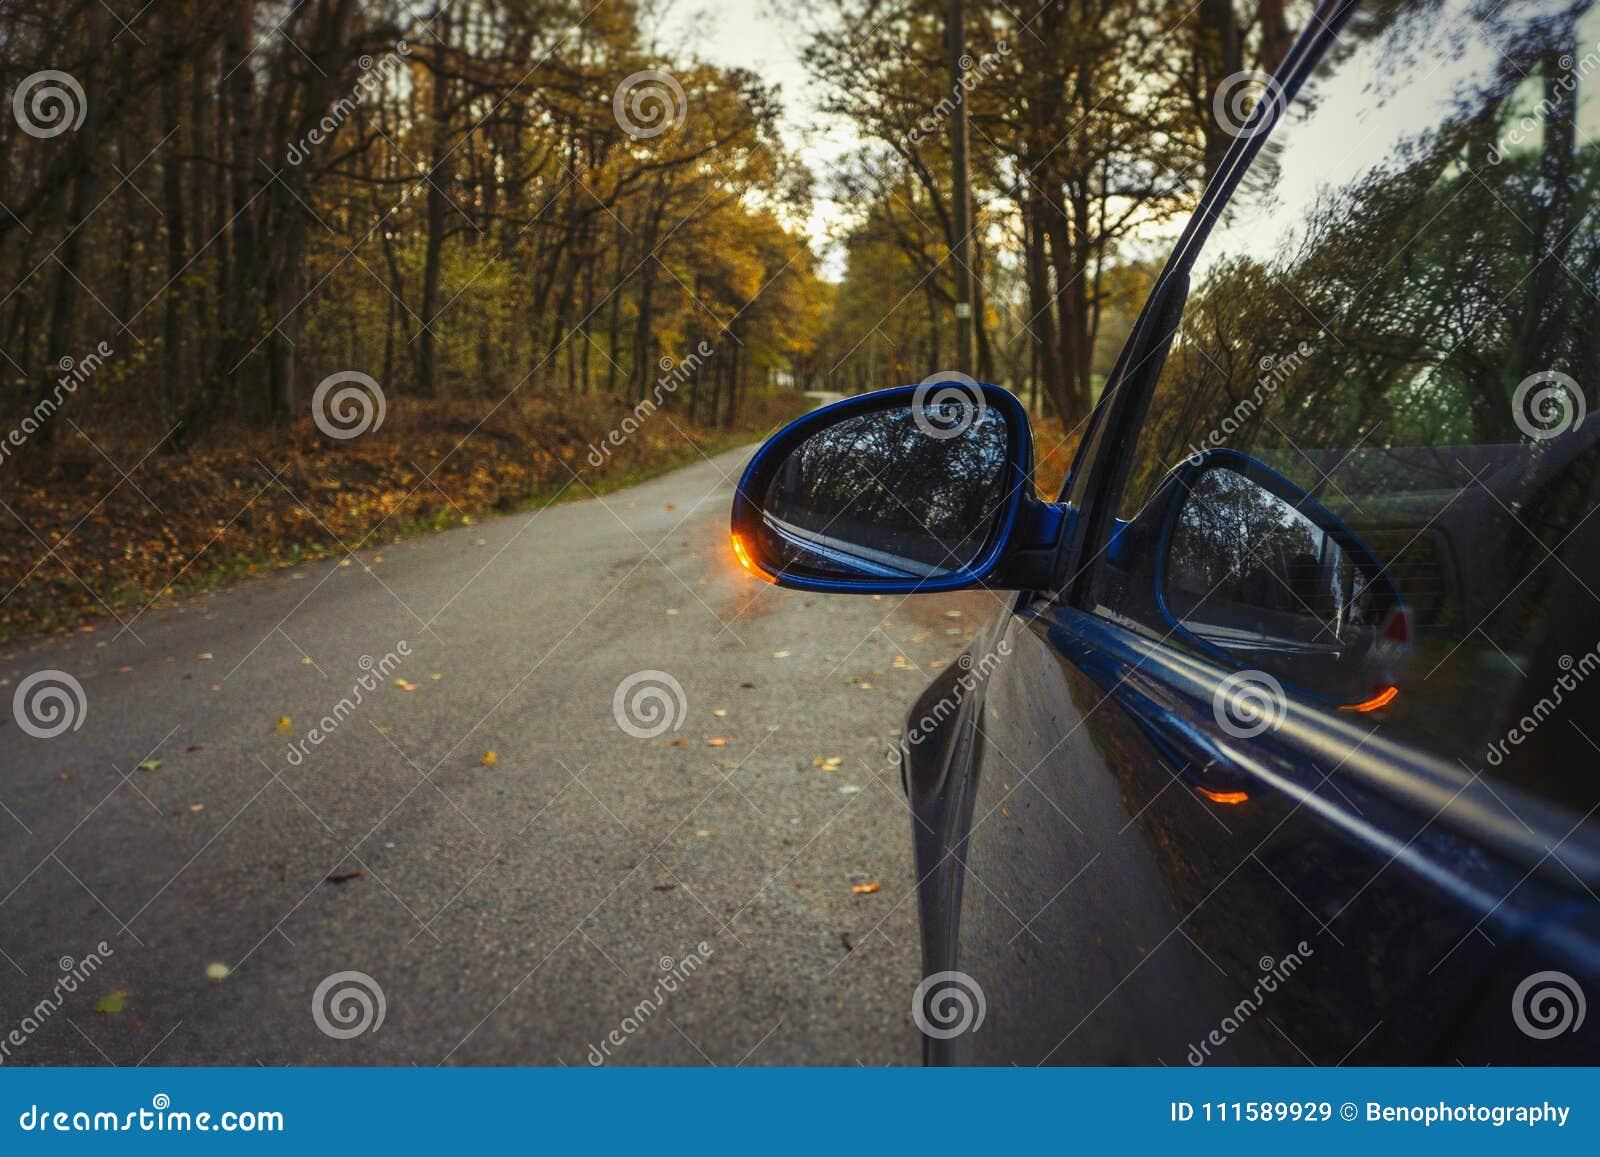 Side Mirror Turn Signal  Turn Indicator On The Mirror Left